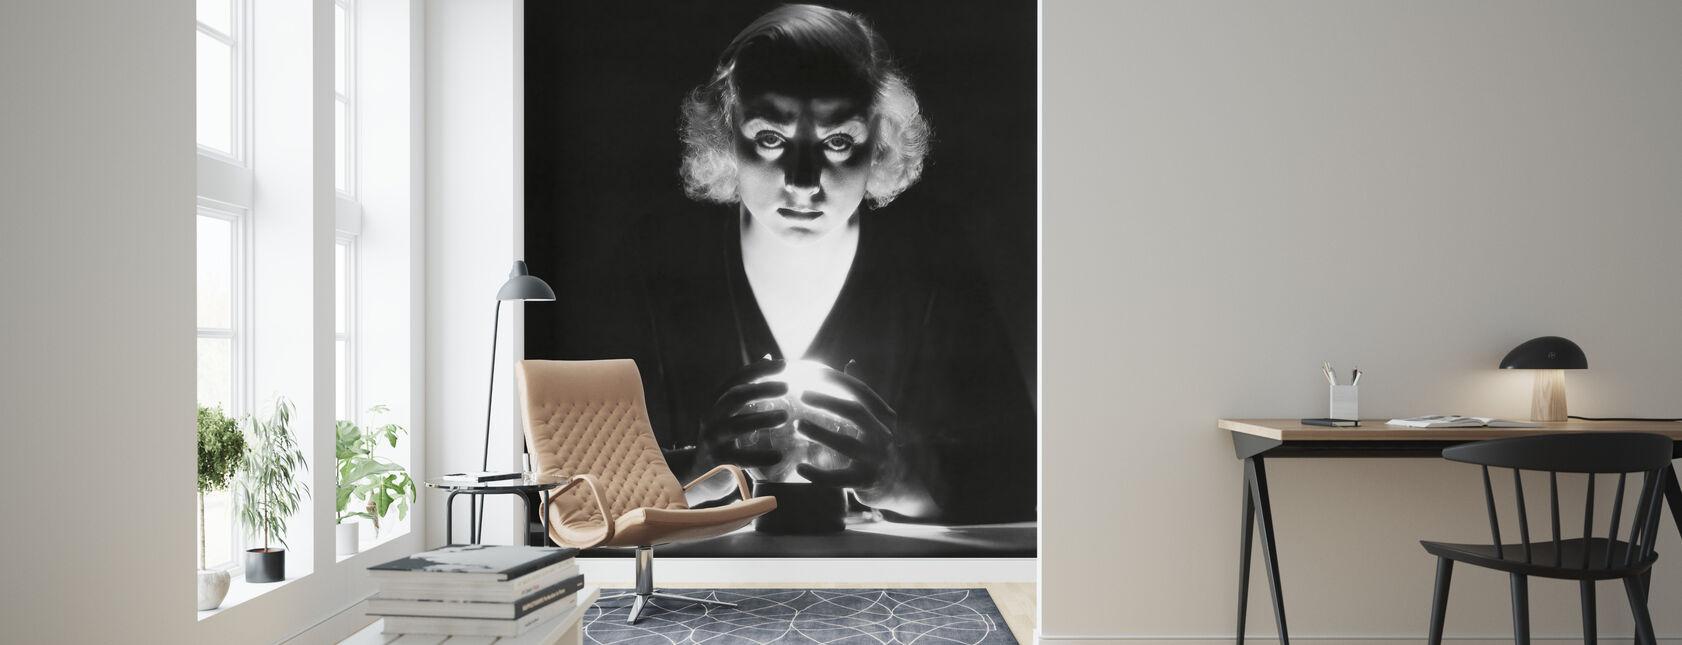 Supernatural - Carole Lombard - Wallpaper - Living Room